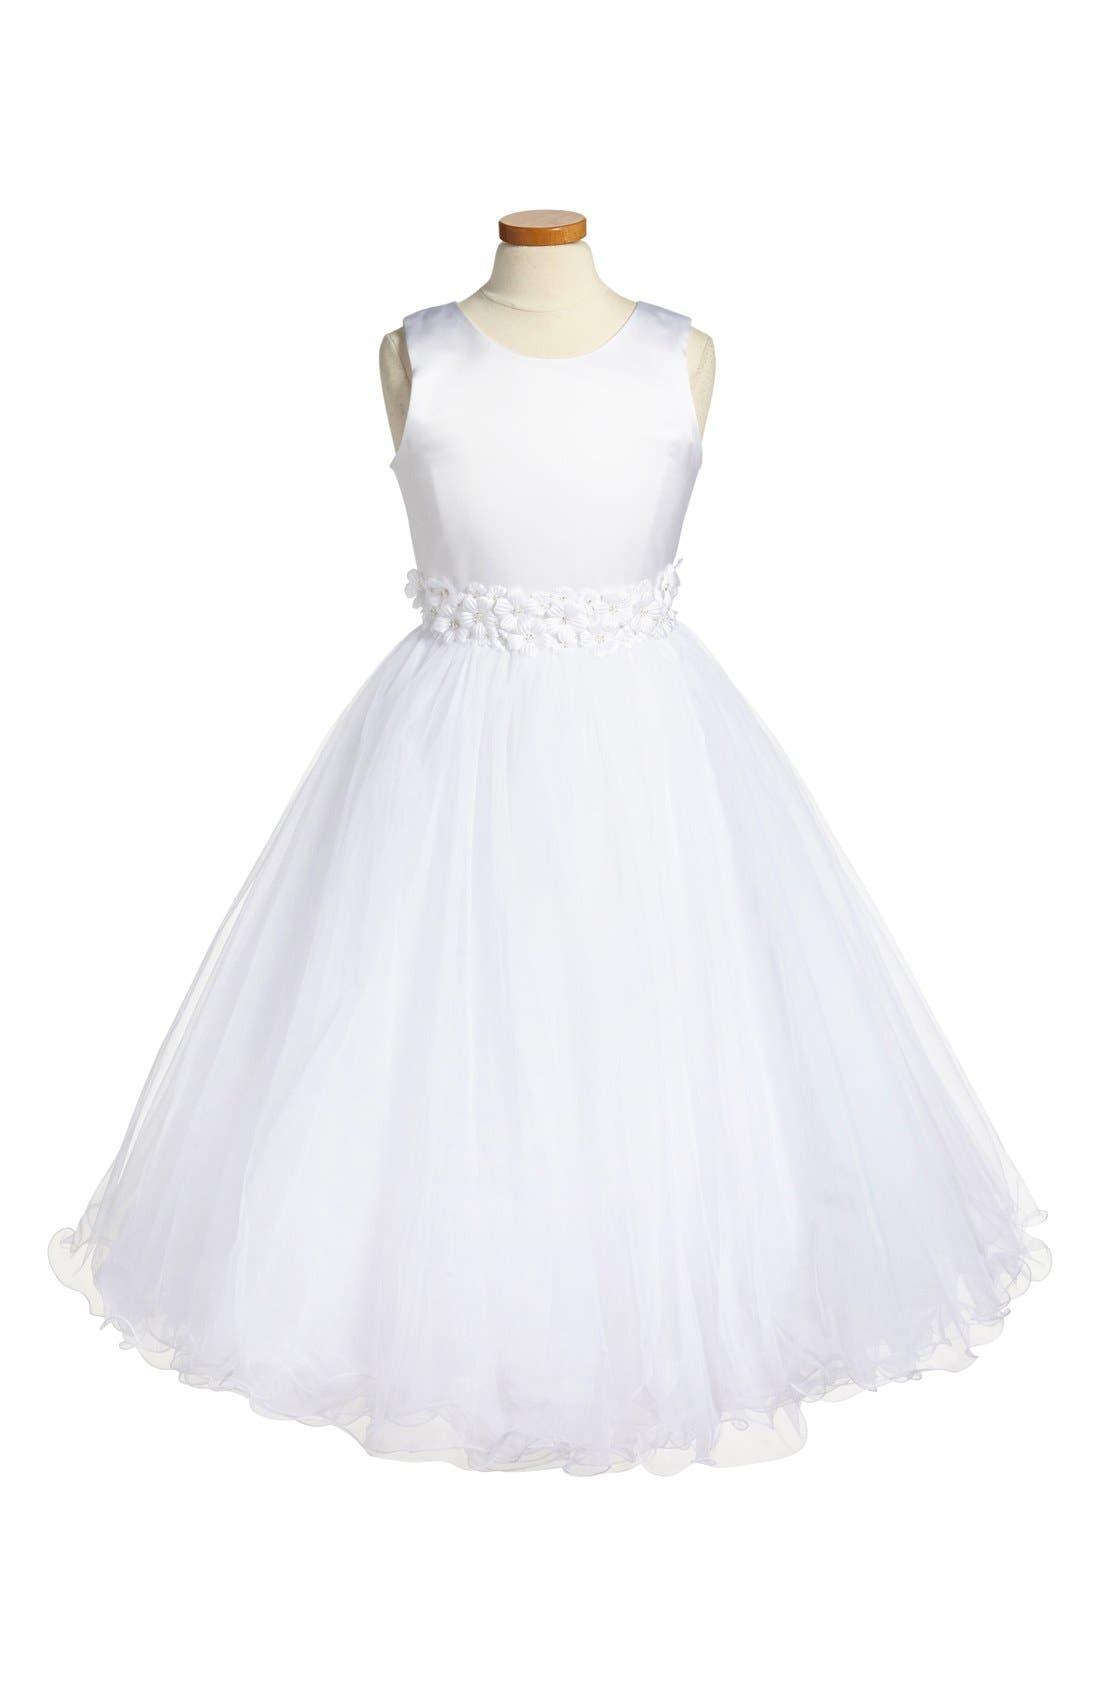 Main Image - Joan Calabrese for Mon Cheri Sleeveless First Communion Dress (Little Girls & Big Girls)